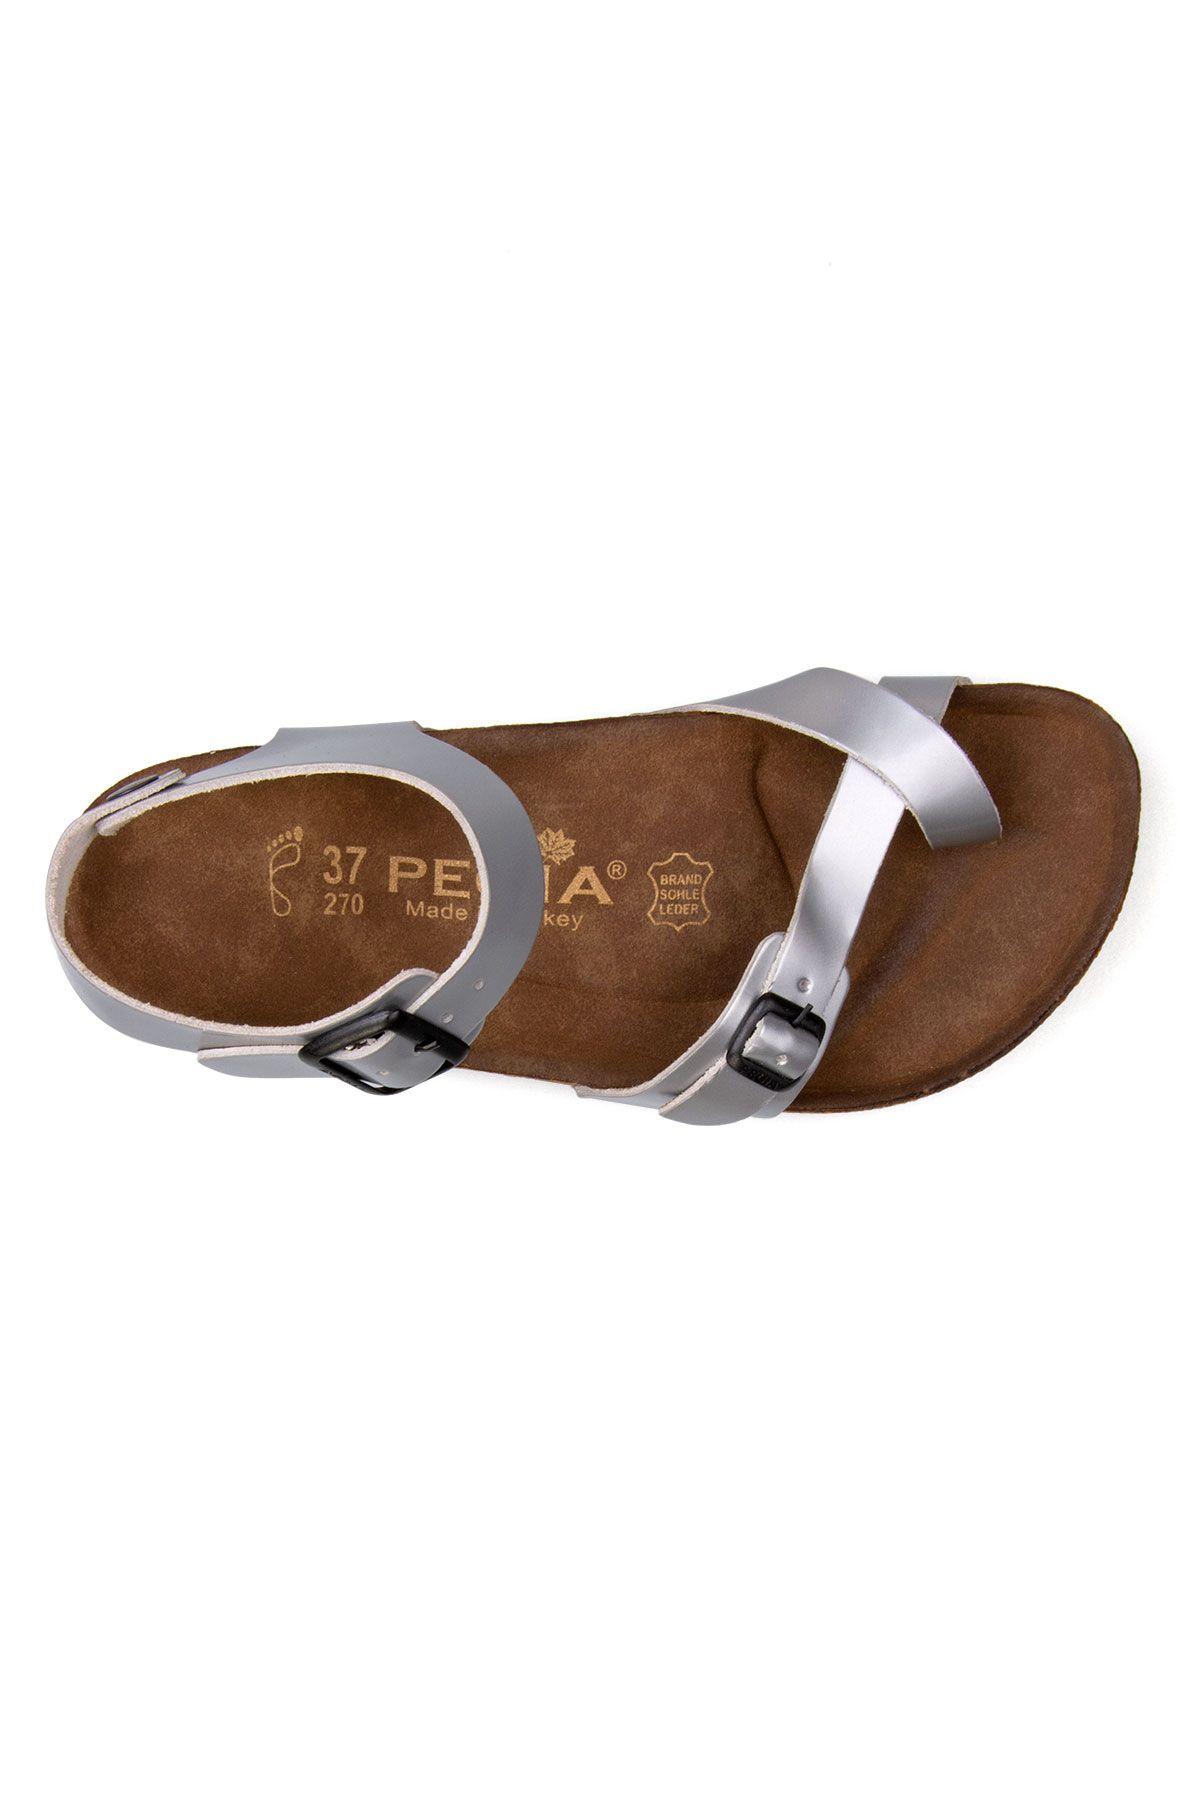 Pegia Genuine Leather Flip-Flops Women's Sandals 215513 Silver